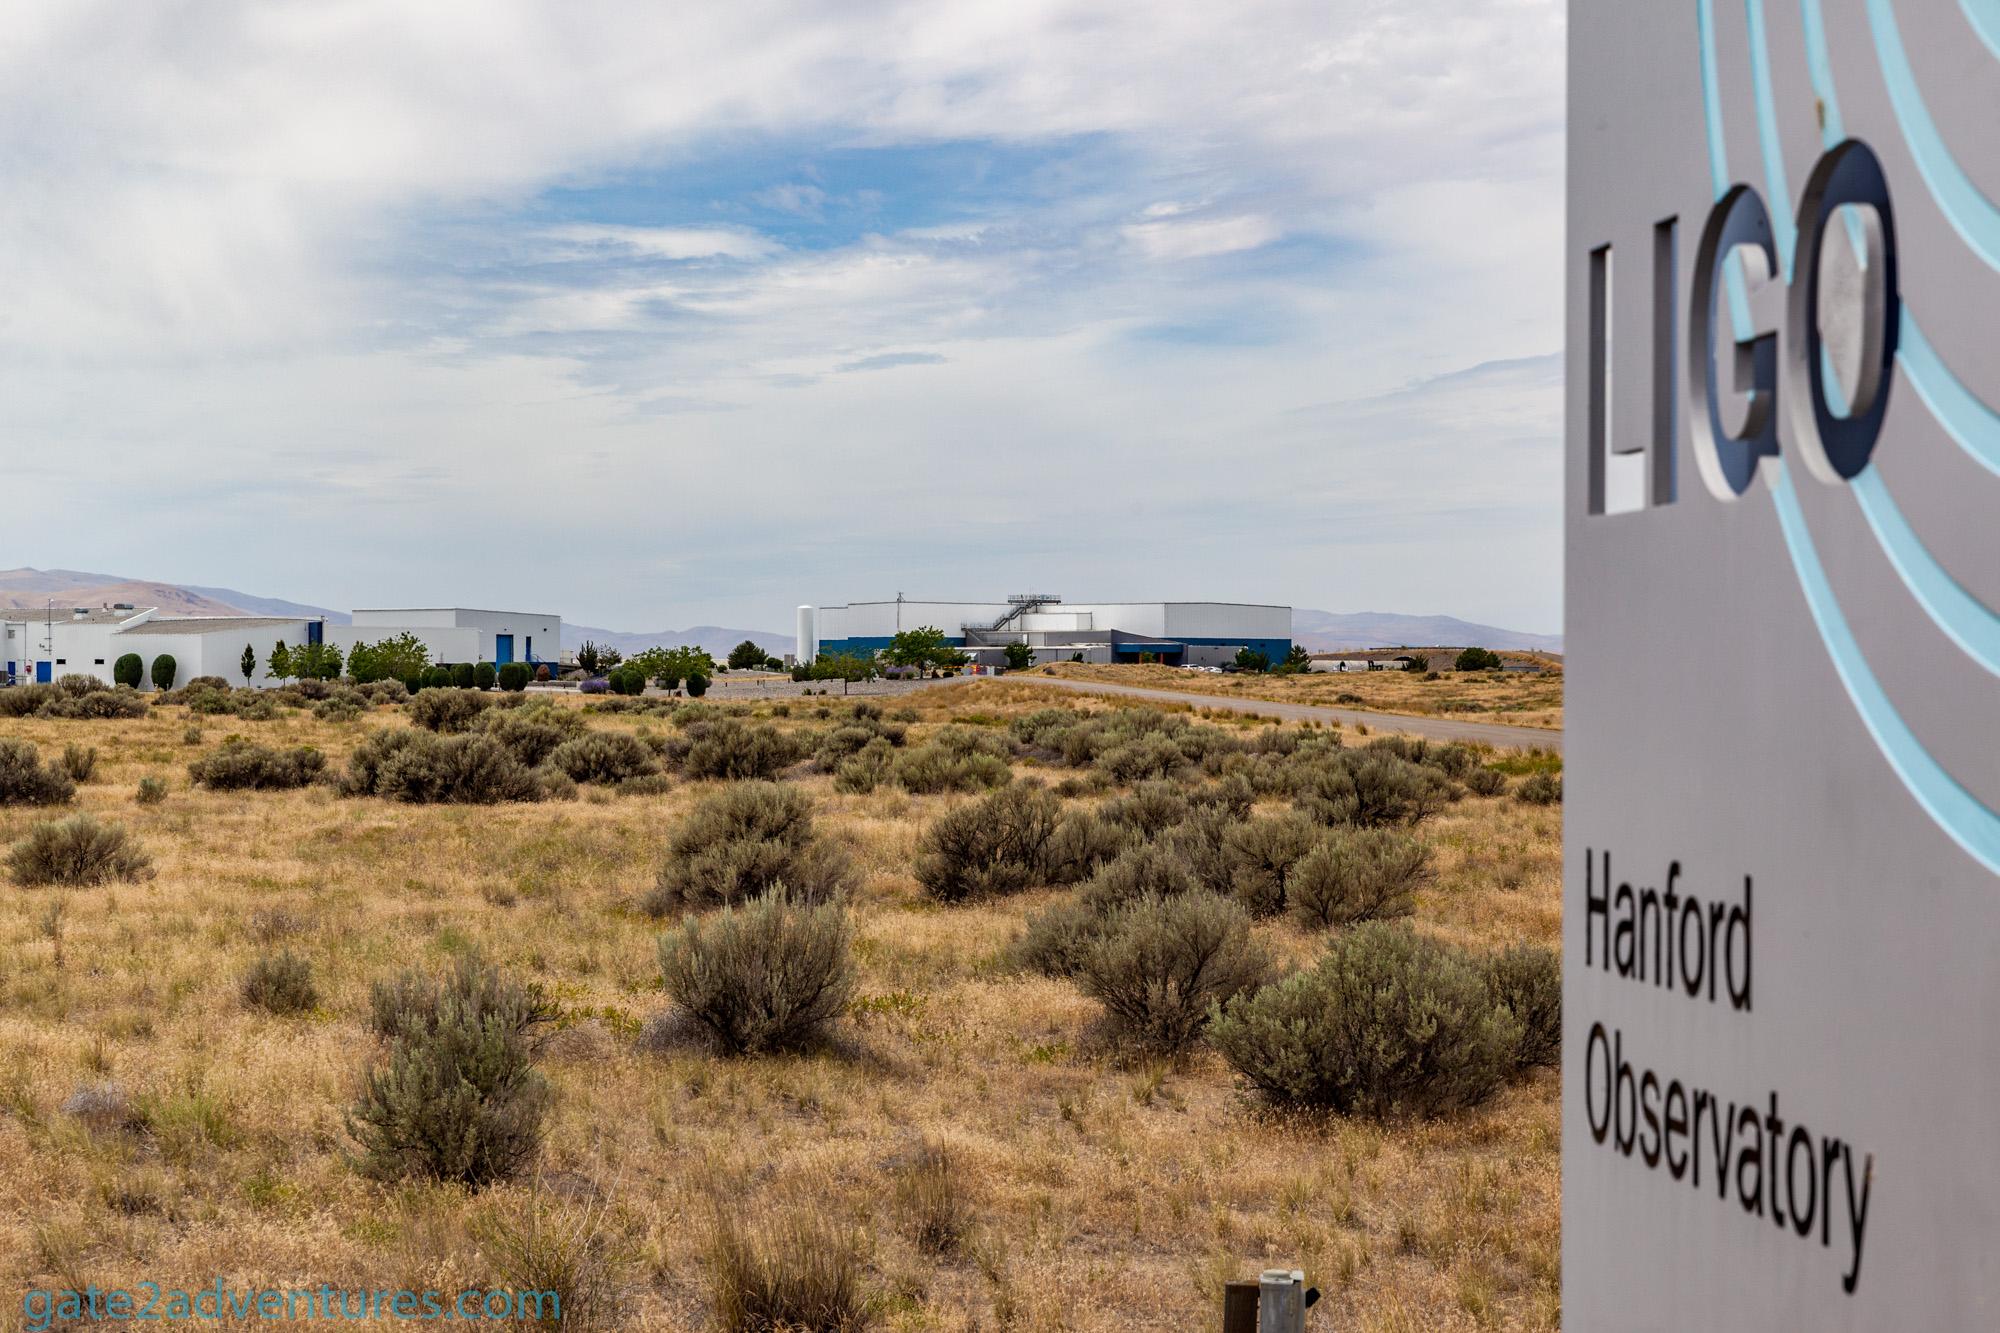 Laser Interferometer Gravitational-Wave Observatory (LIGO) in Hanford, WA